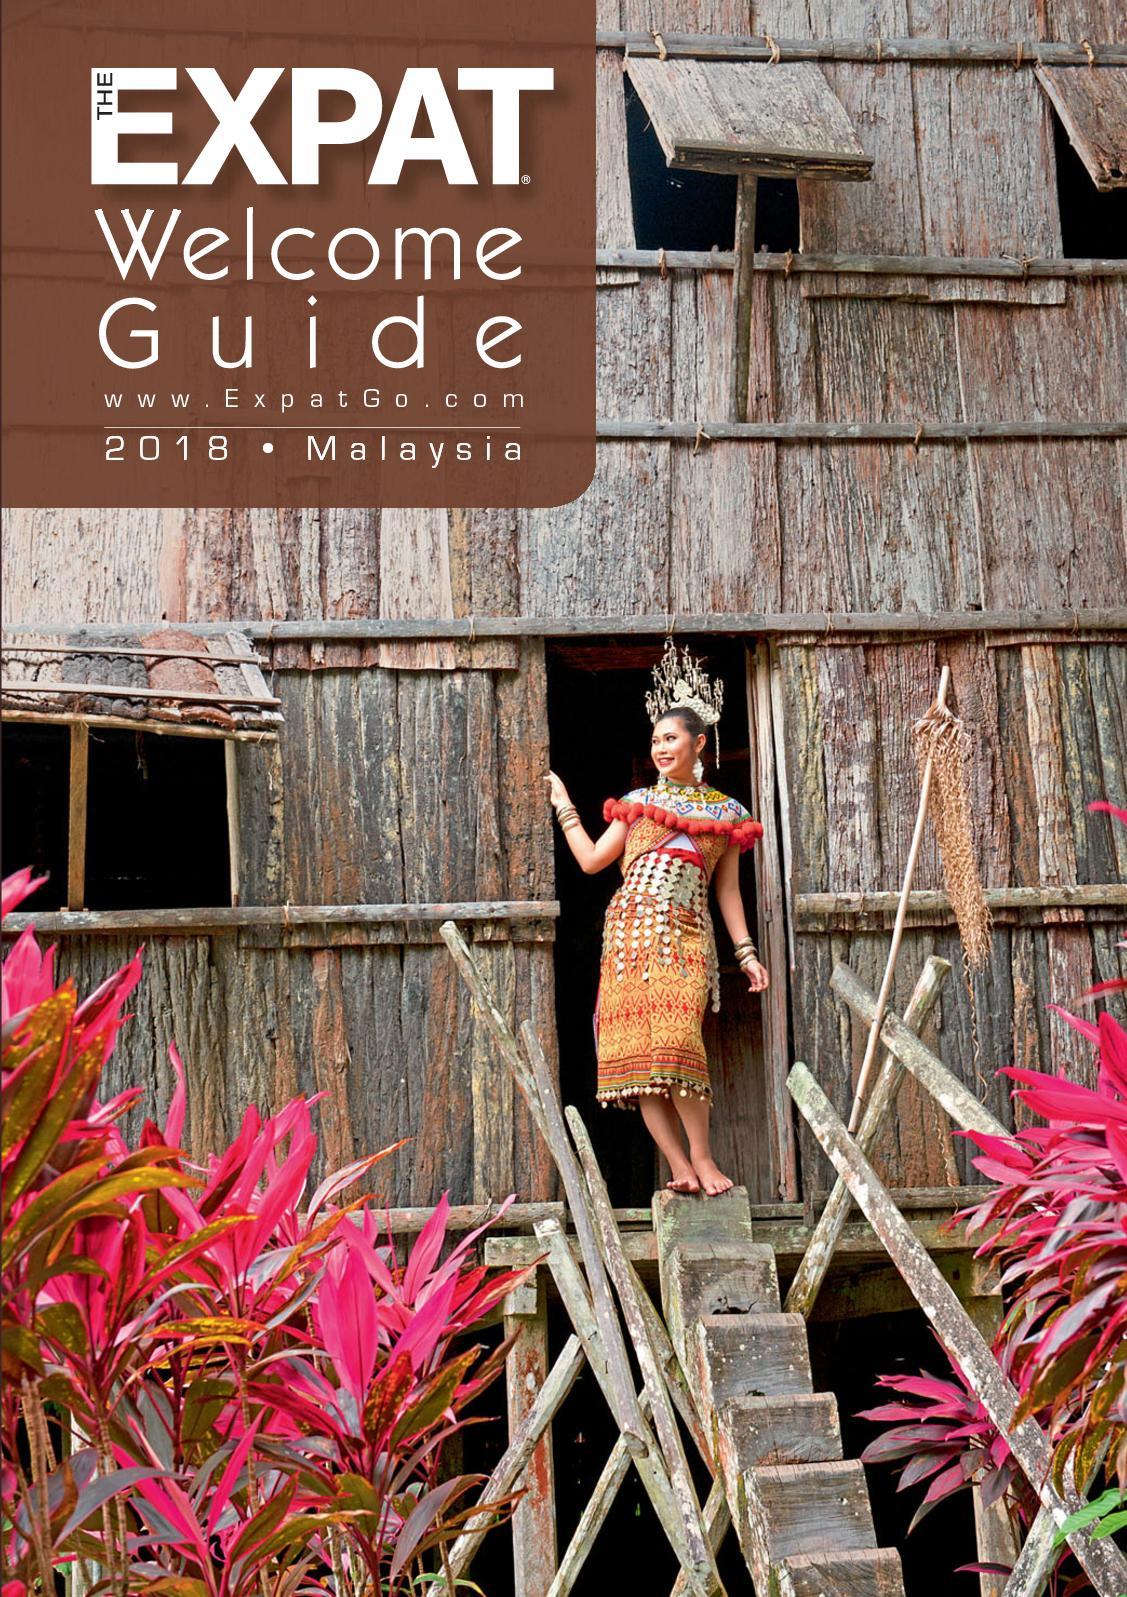 Calamo Expat Welcome Guide 2018 Kacang Sambal By Dua Putri Bjb